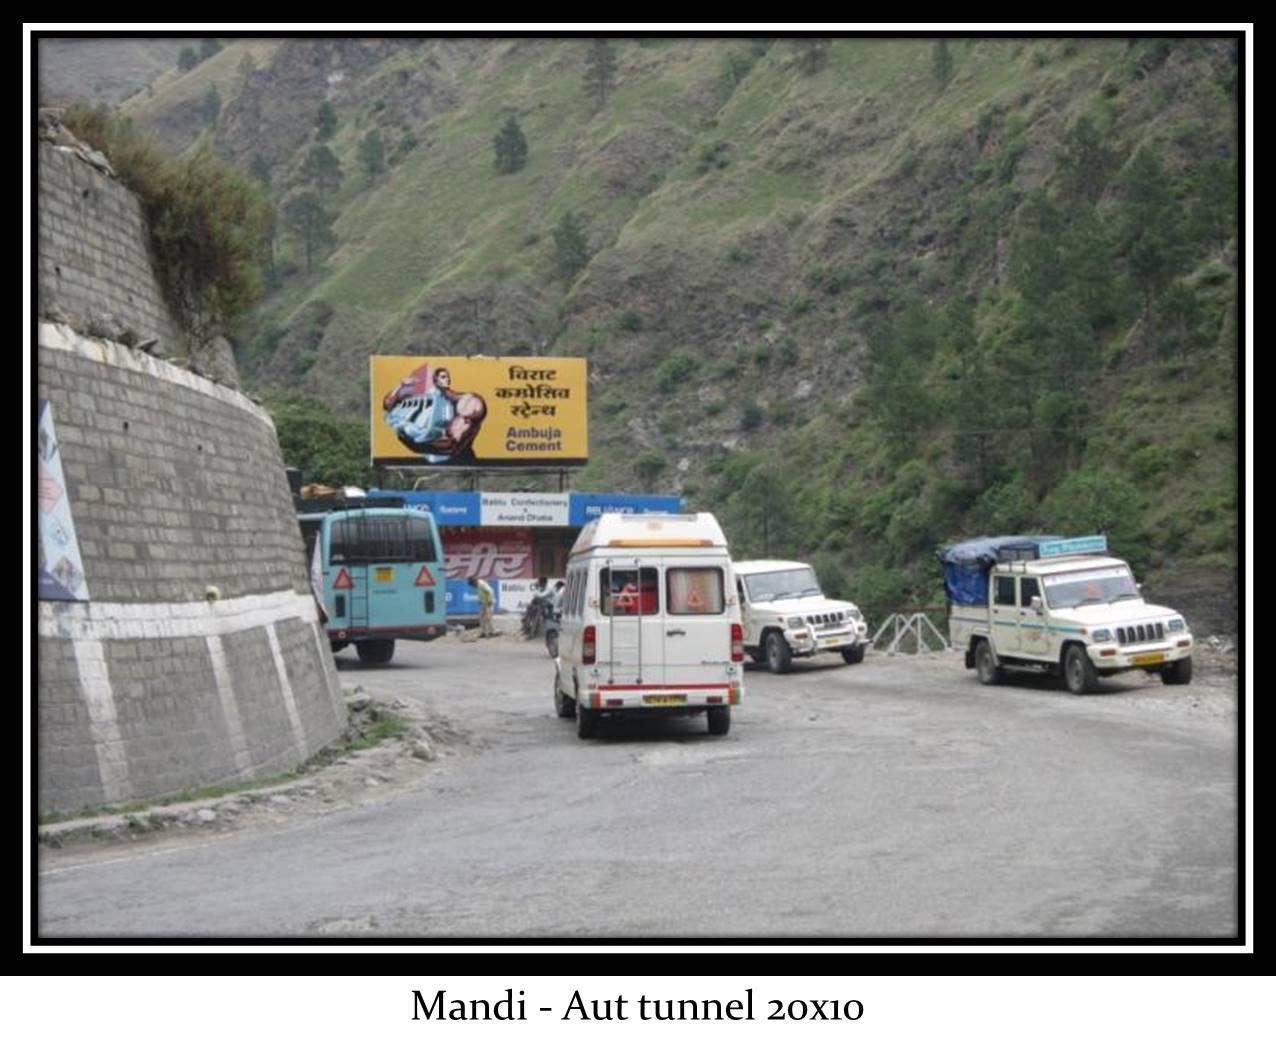 Aut tunnel, Mandi